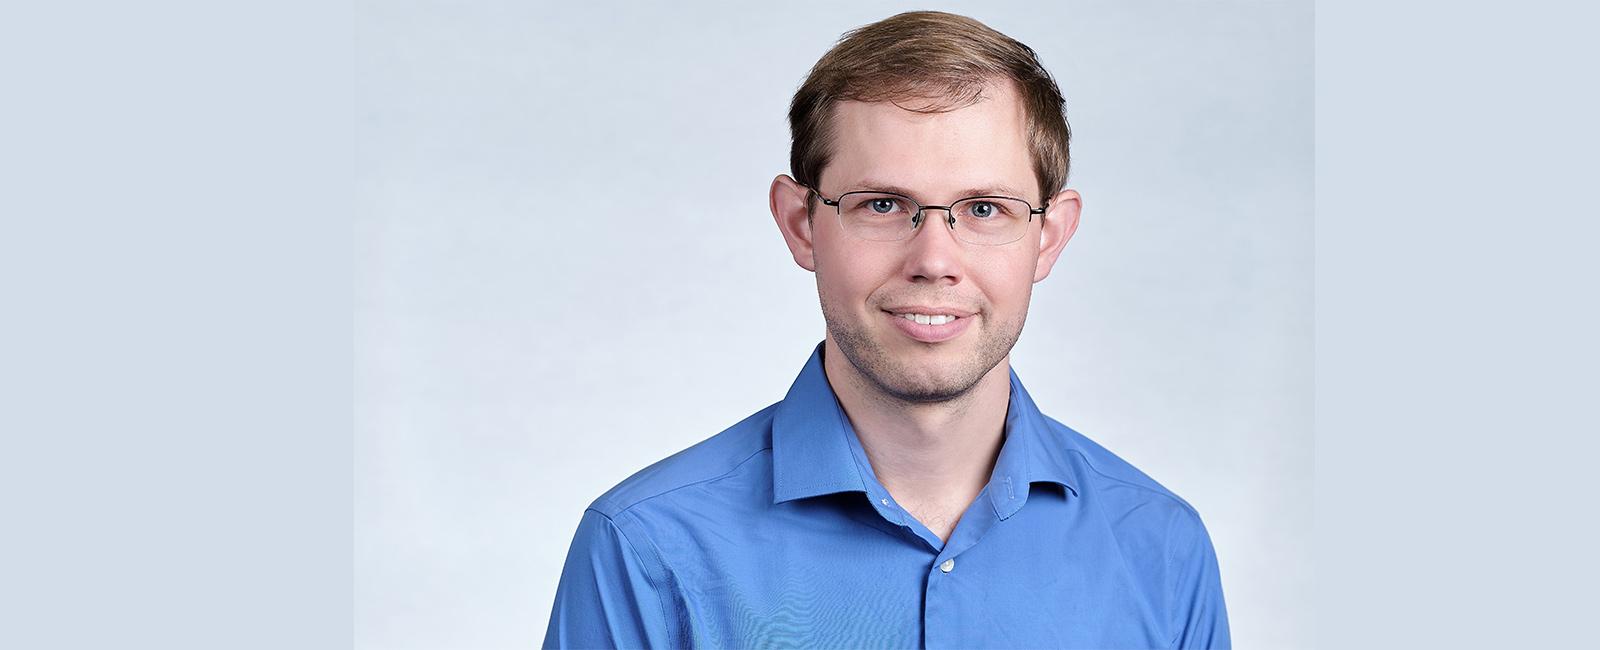 An image of Professor Brett McGuire.